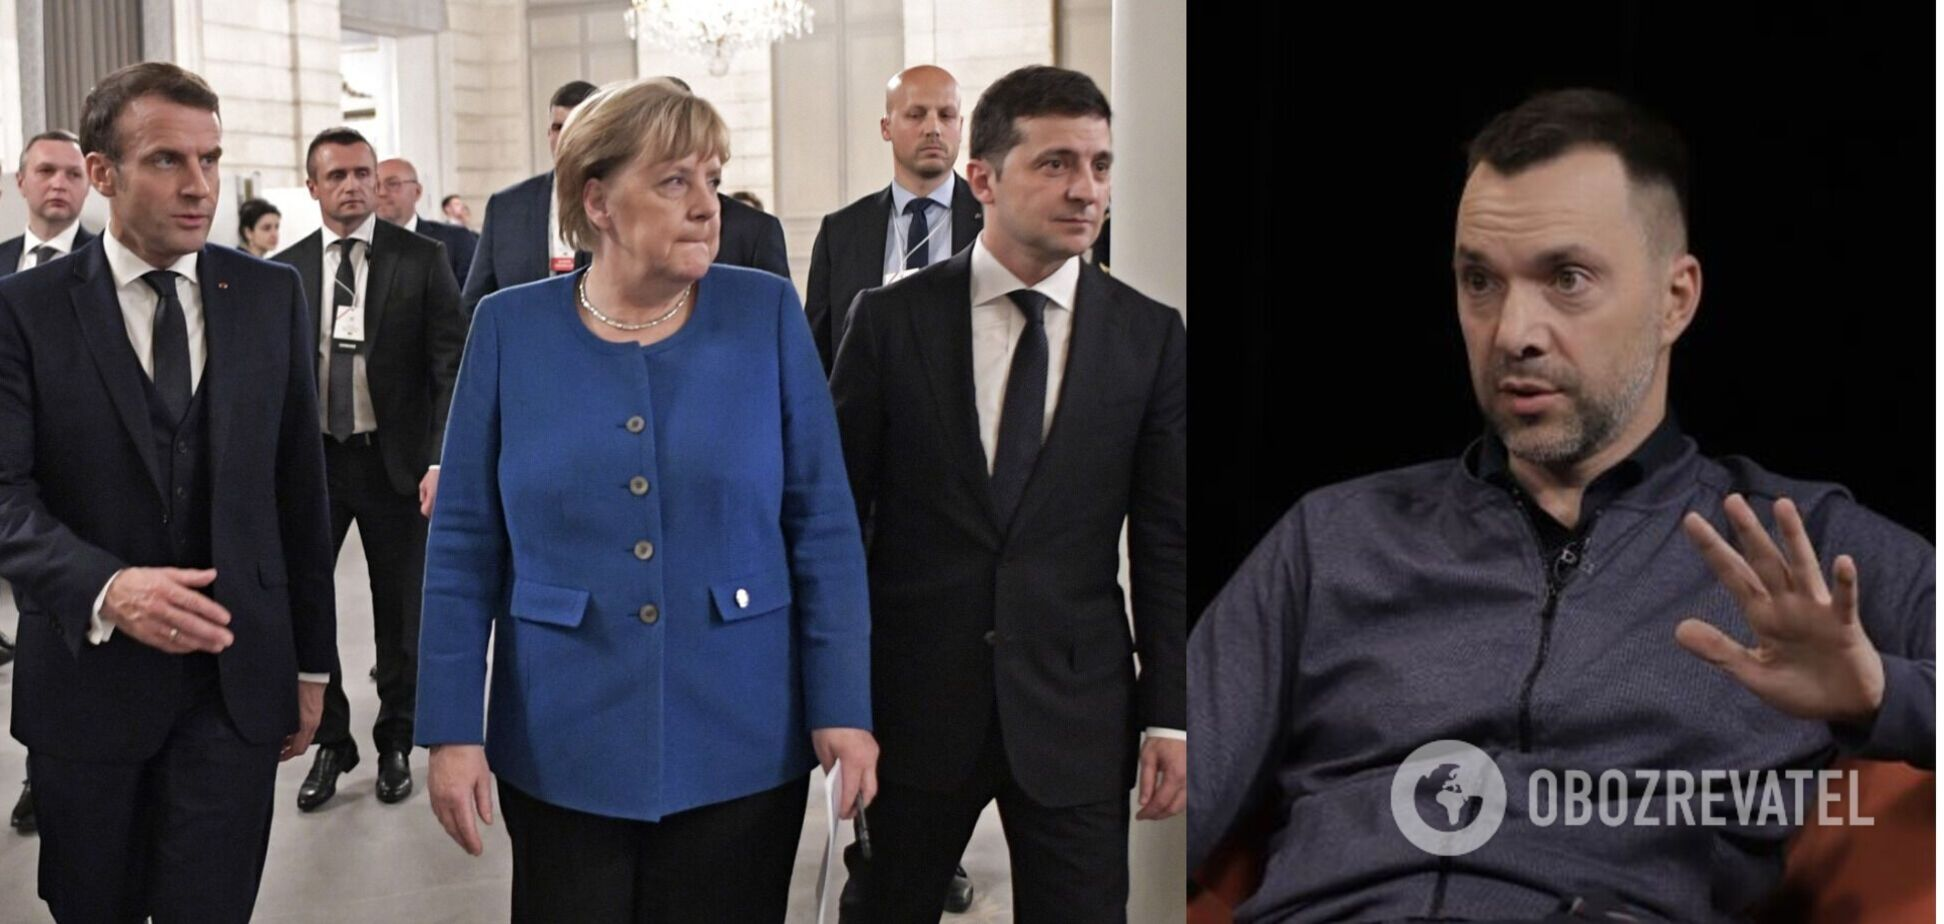 Арестович озвучил сроки встречи лидеров 'нормандского формата' без России